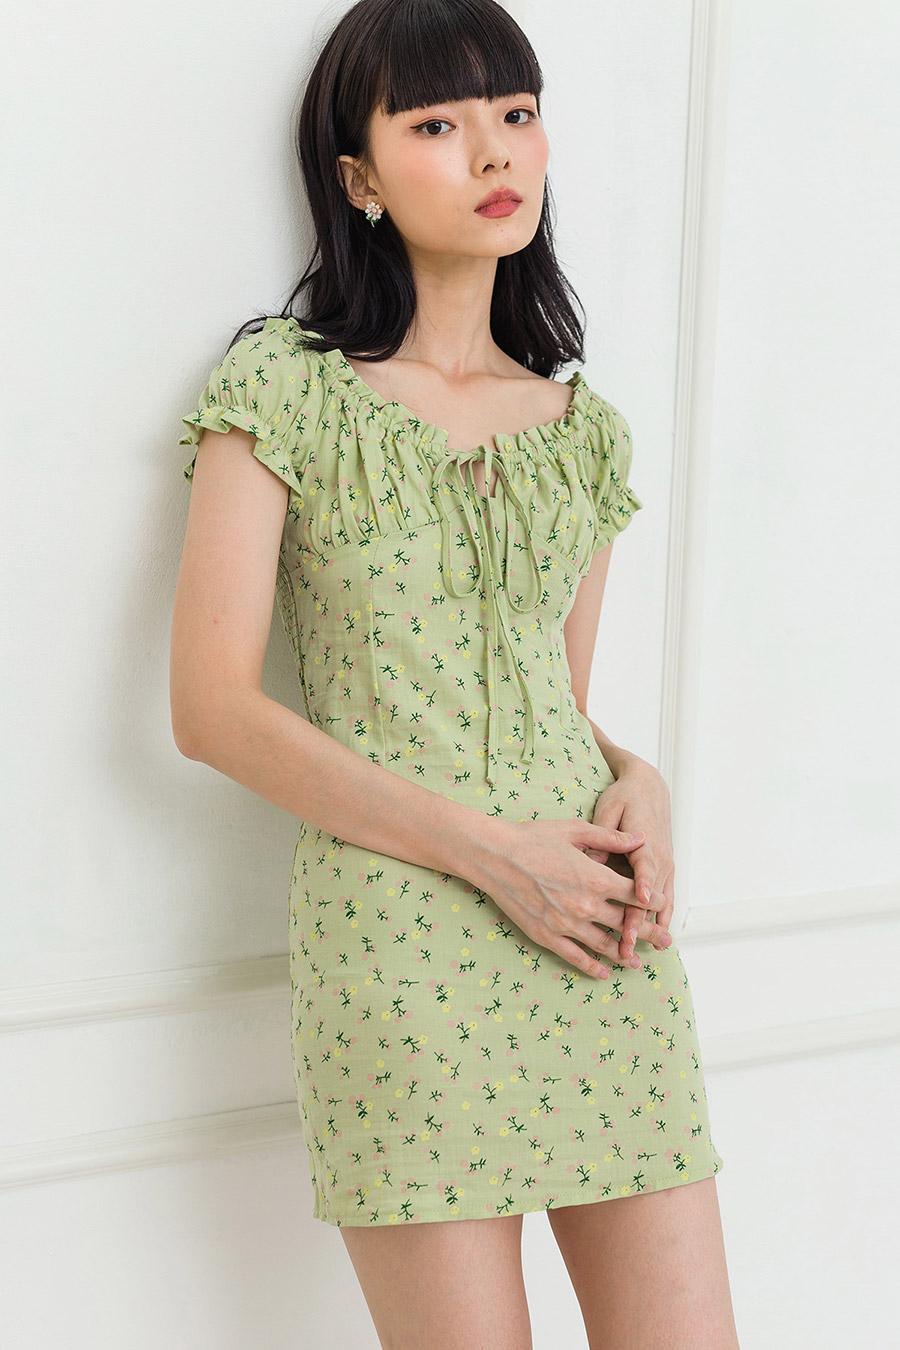 YUKIO DRESS - PISTACHIO FLEUR